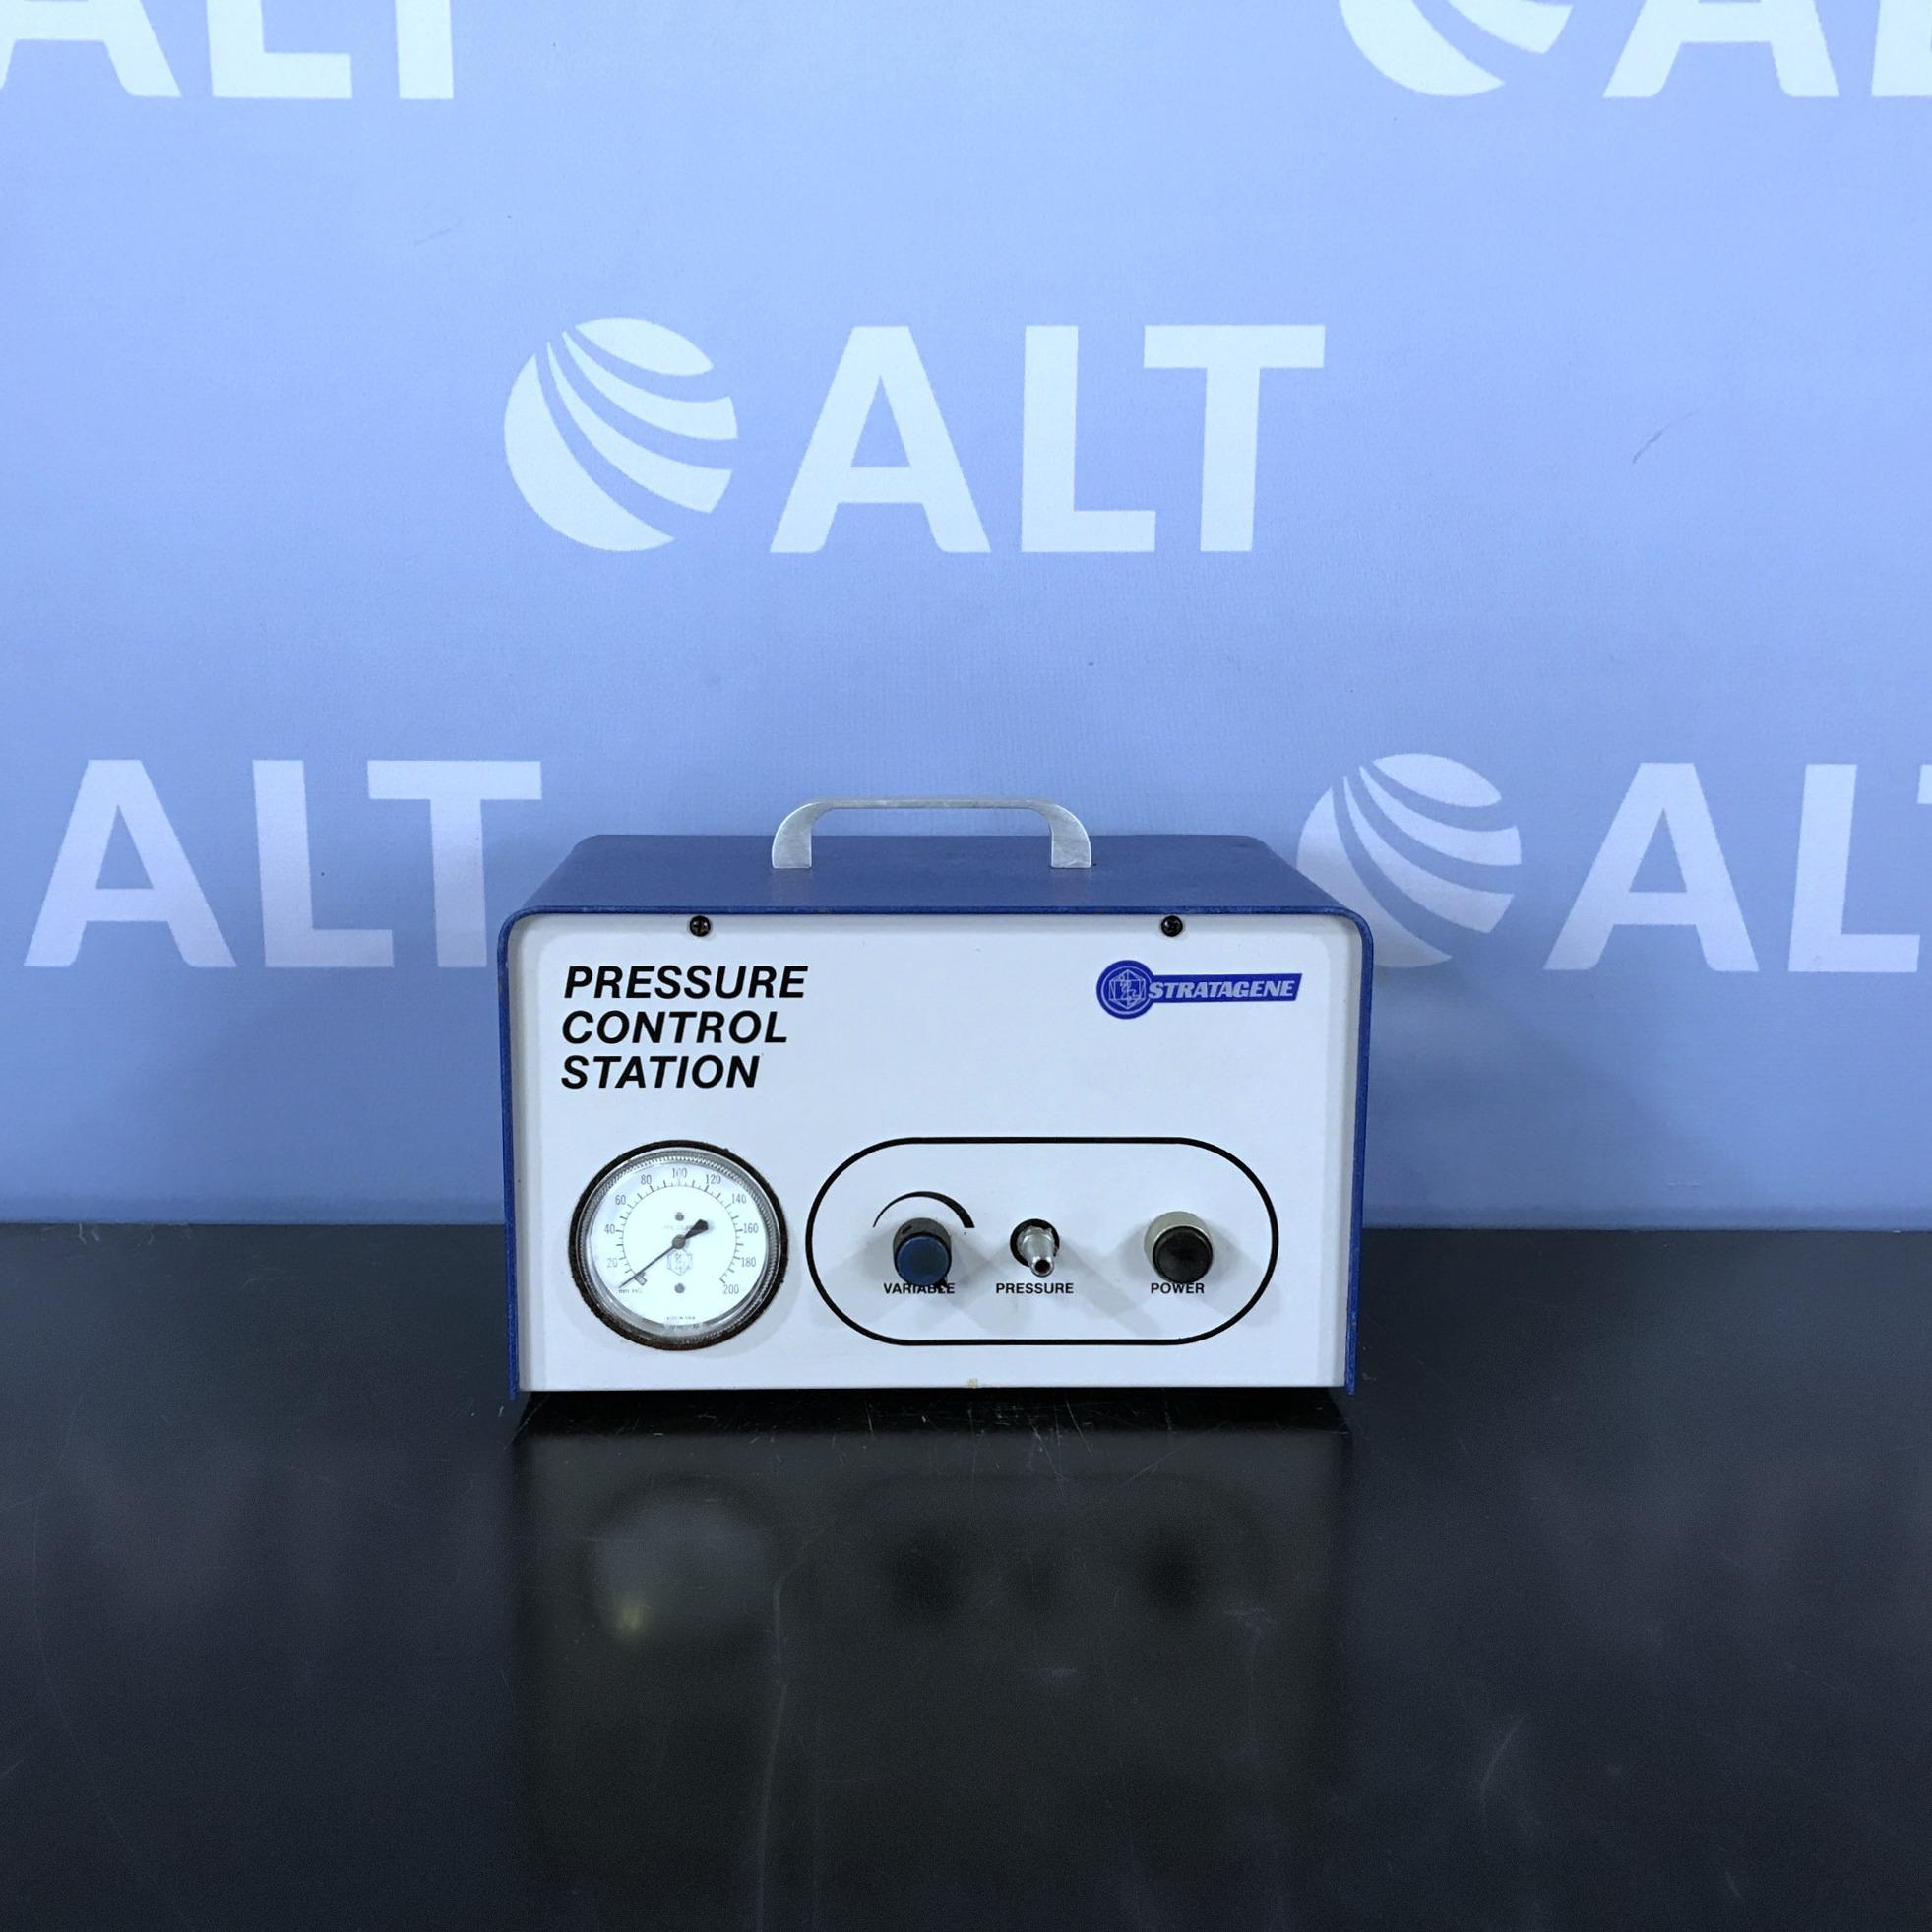 Pressure Control Station Name